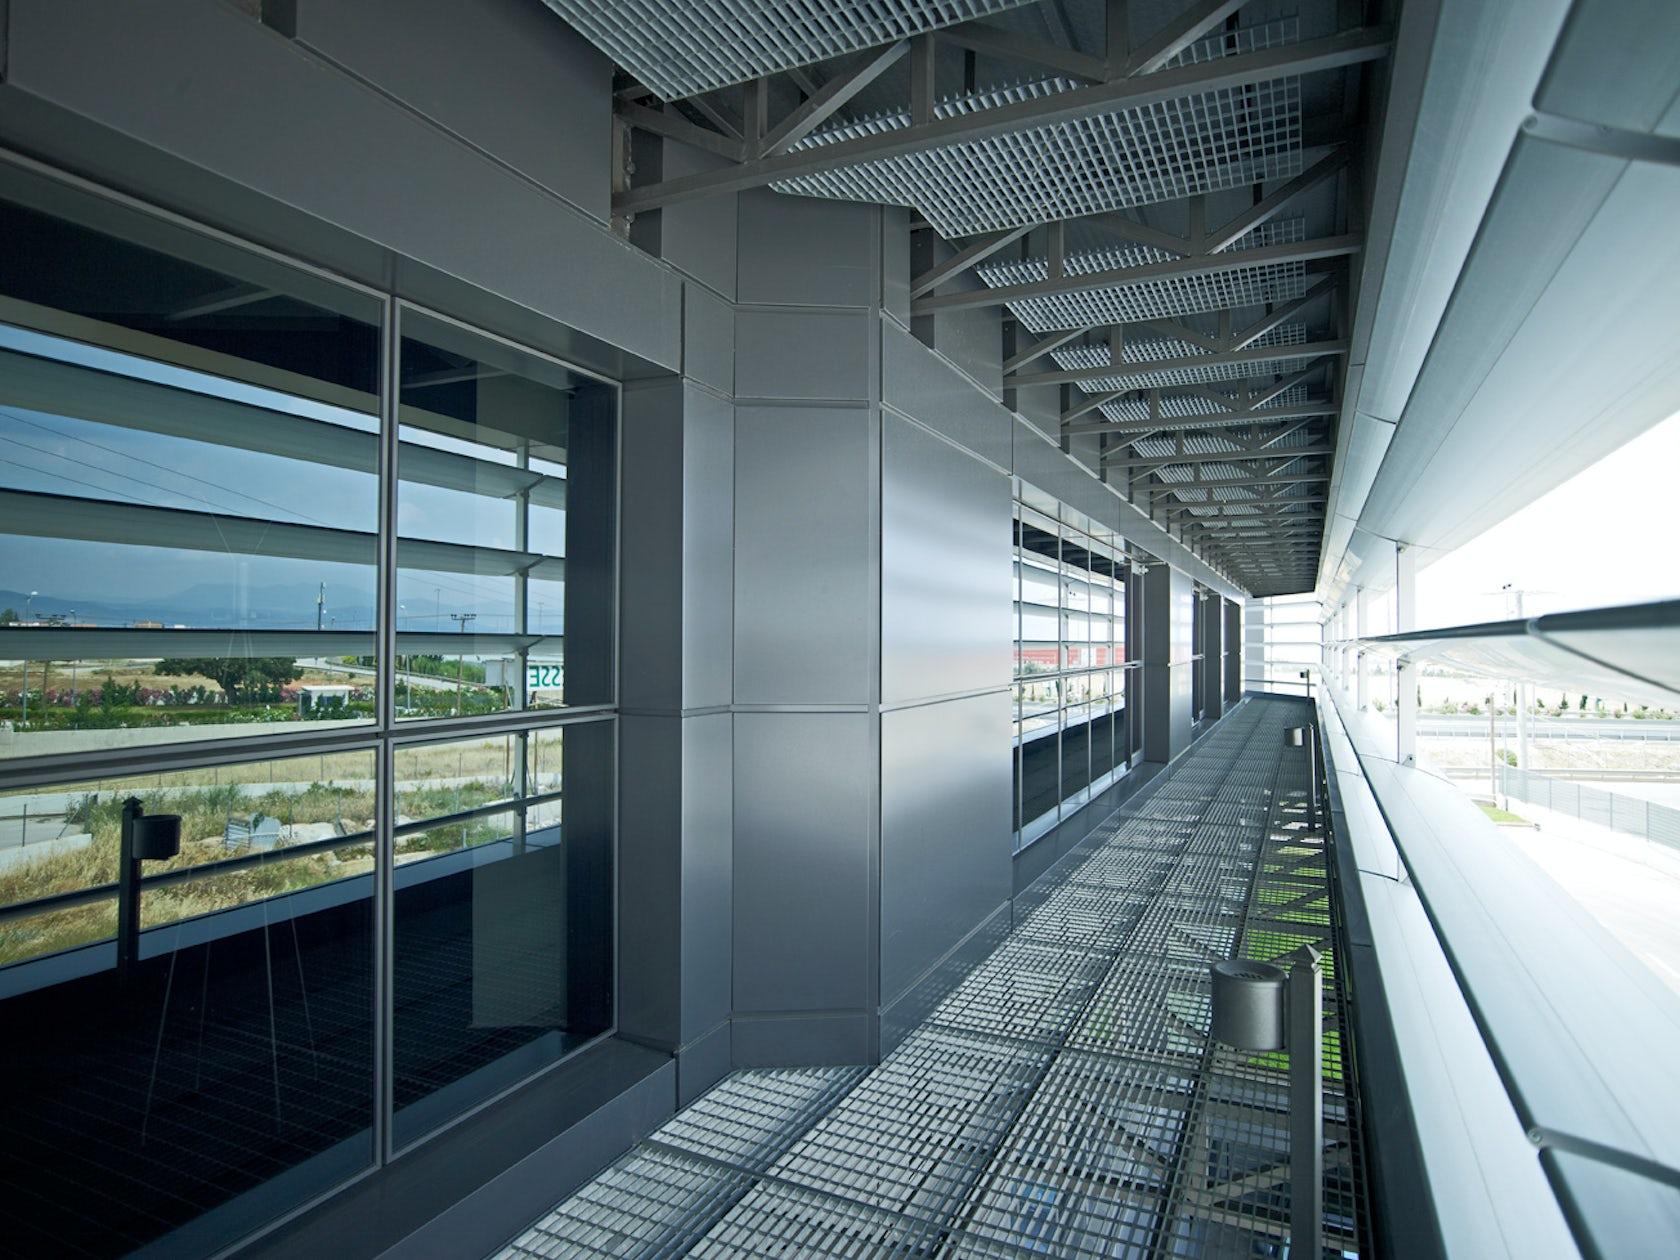 Office Storage Building : Office storage building inspiration yvotube